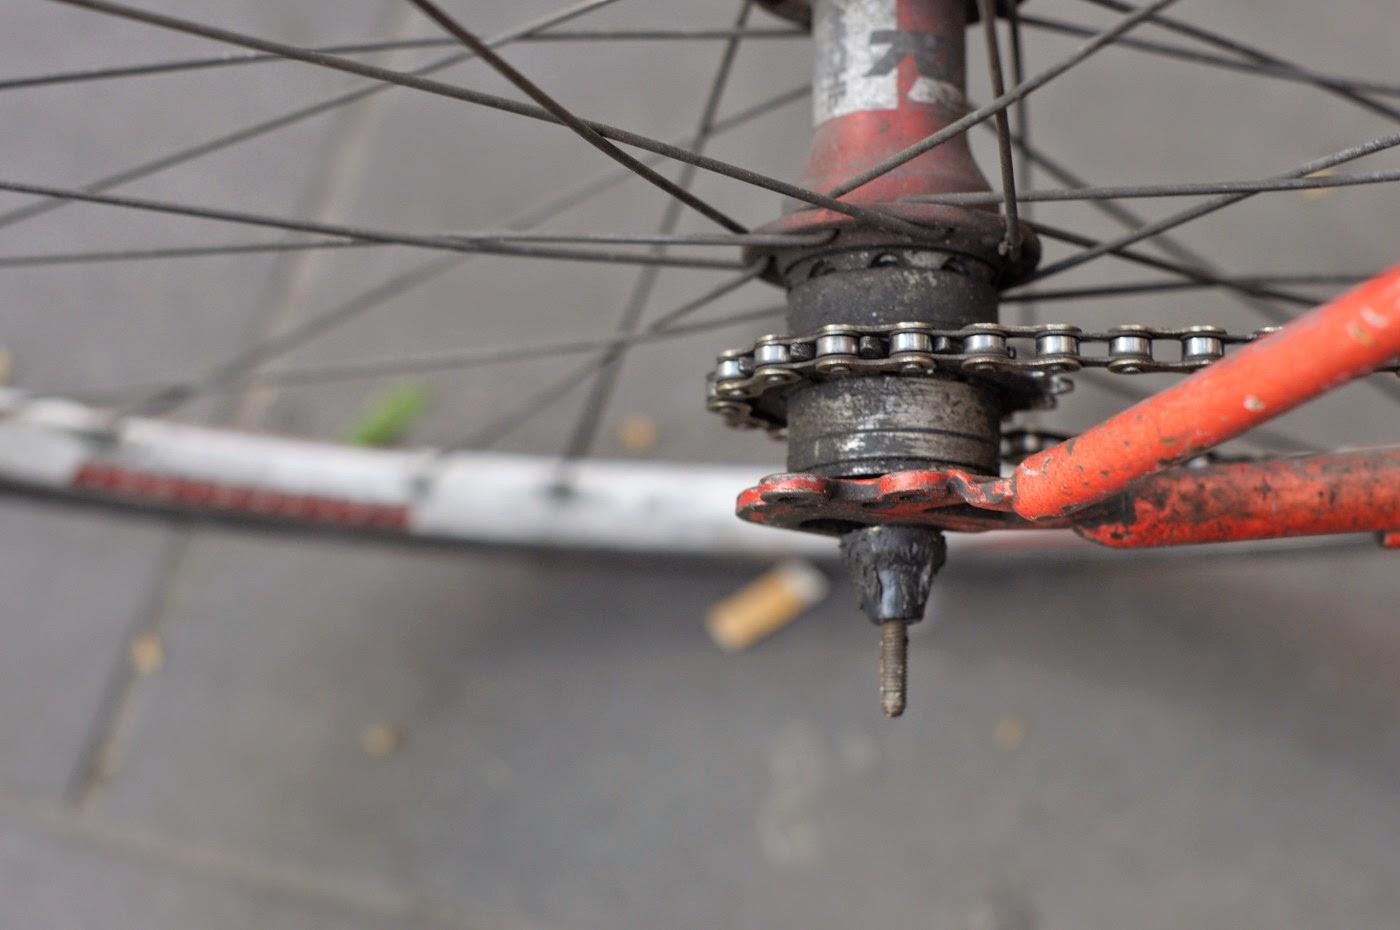 bespoke, custom, single speed, conversion, road bike, swanston st, Melbourne, Australia, decals, stickers, red, selle, miche